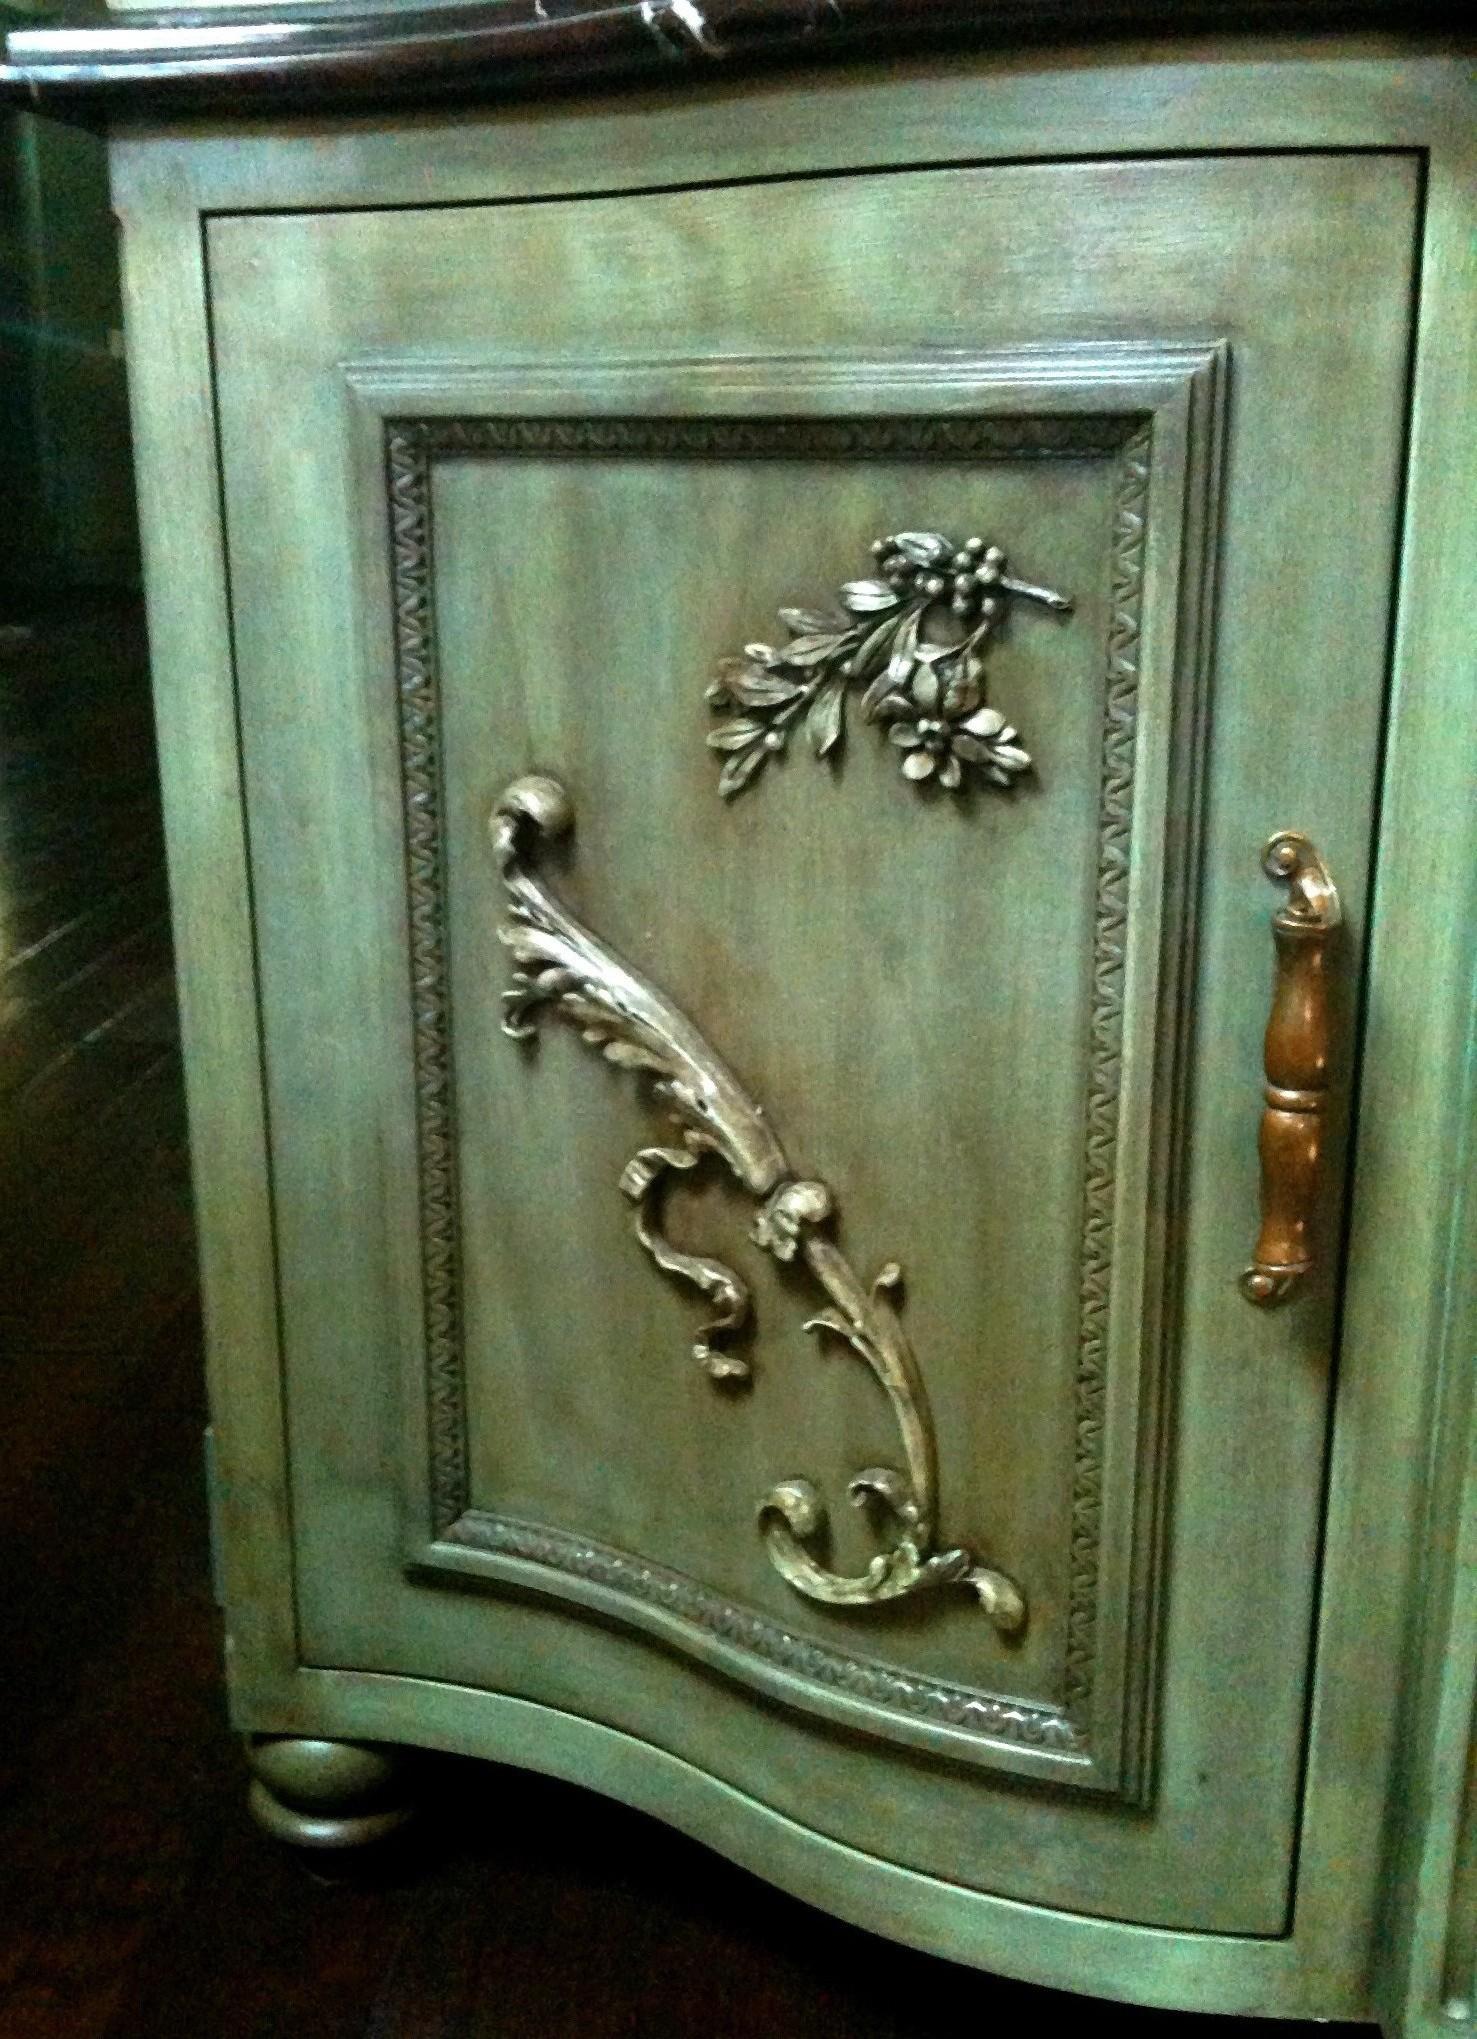 Kitchen hutch door with embellishments.